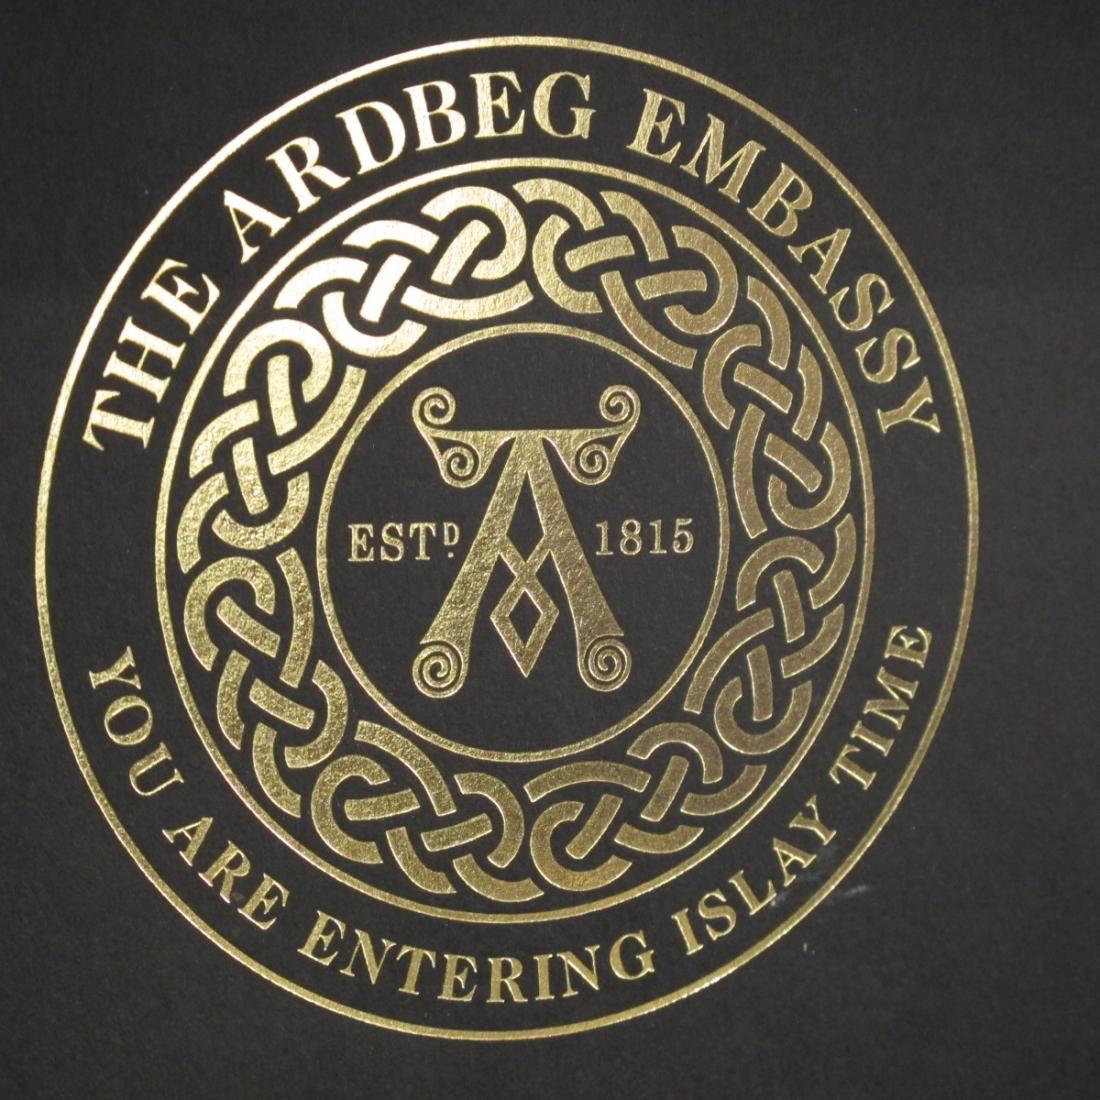 Ardbeg Official Embassy Diplomatic Box 2011 / Sample Miniatures 4 x 6cl and Handbook